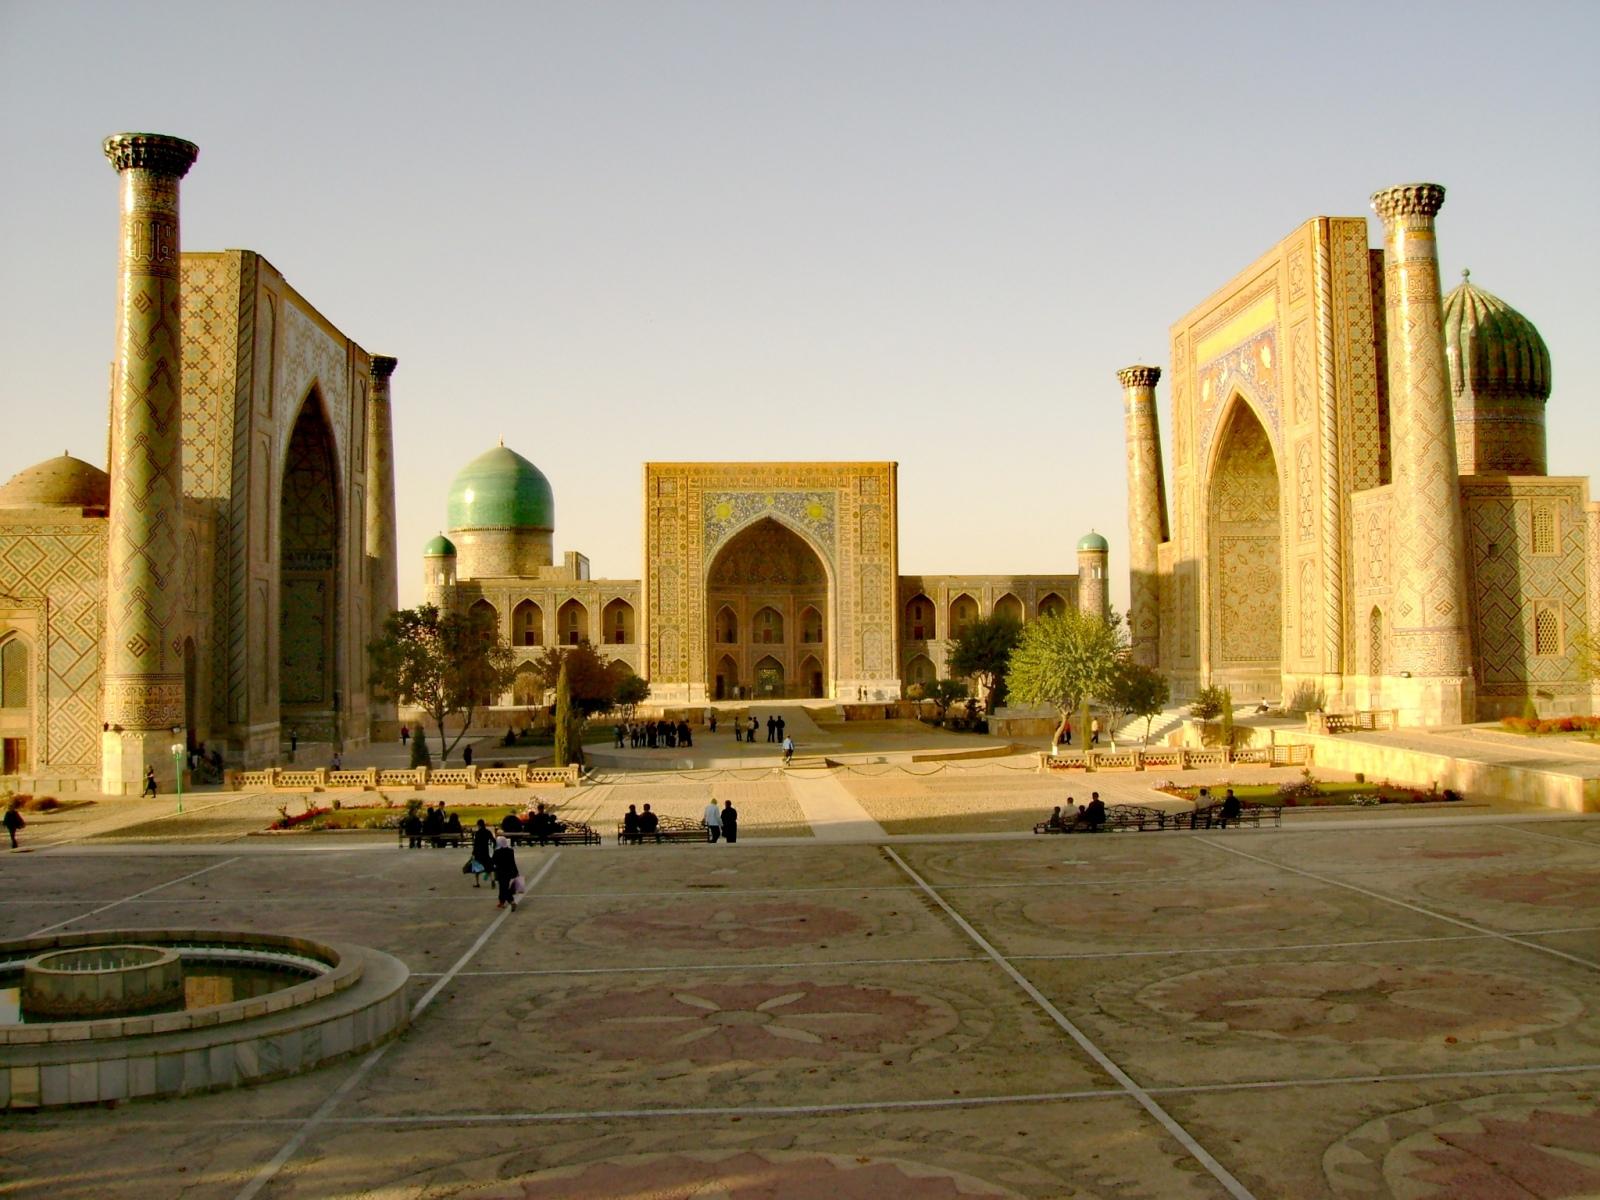 FOTO-NR.-6-Samarcanda-la-maestosa-Piazza-Registan